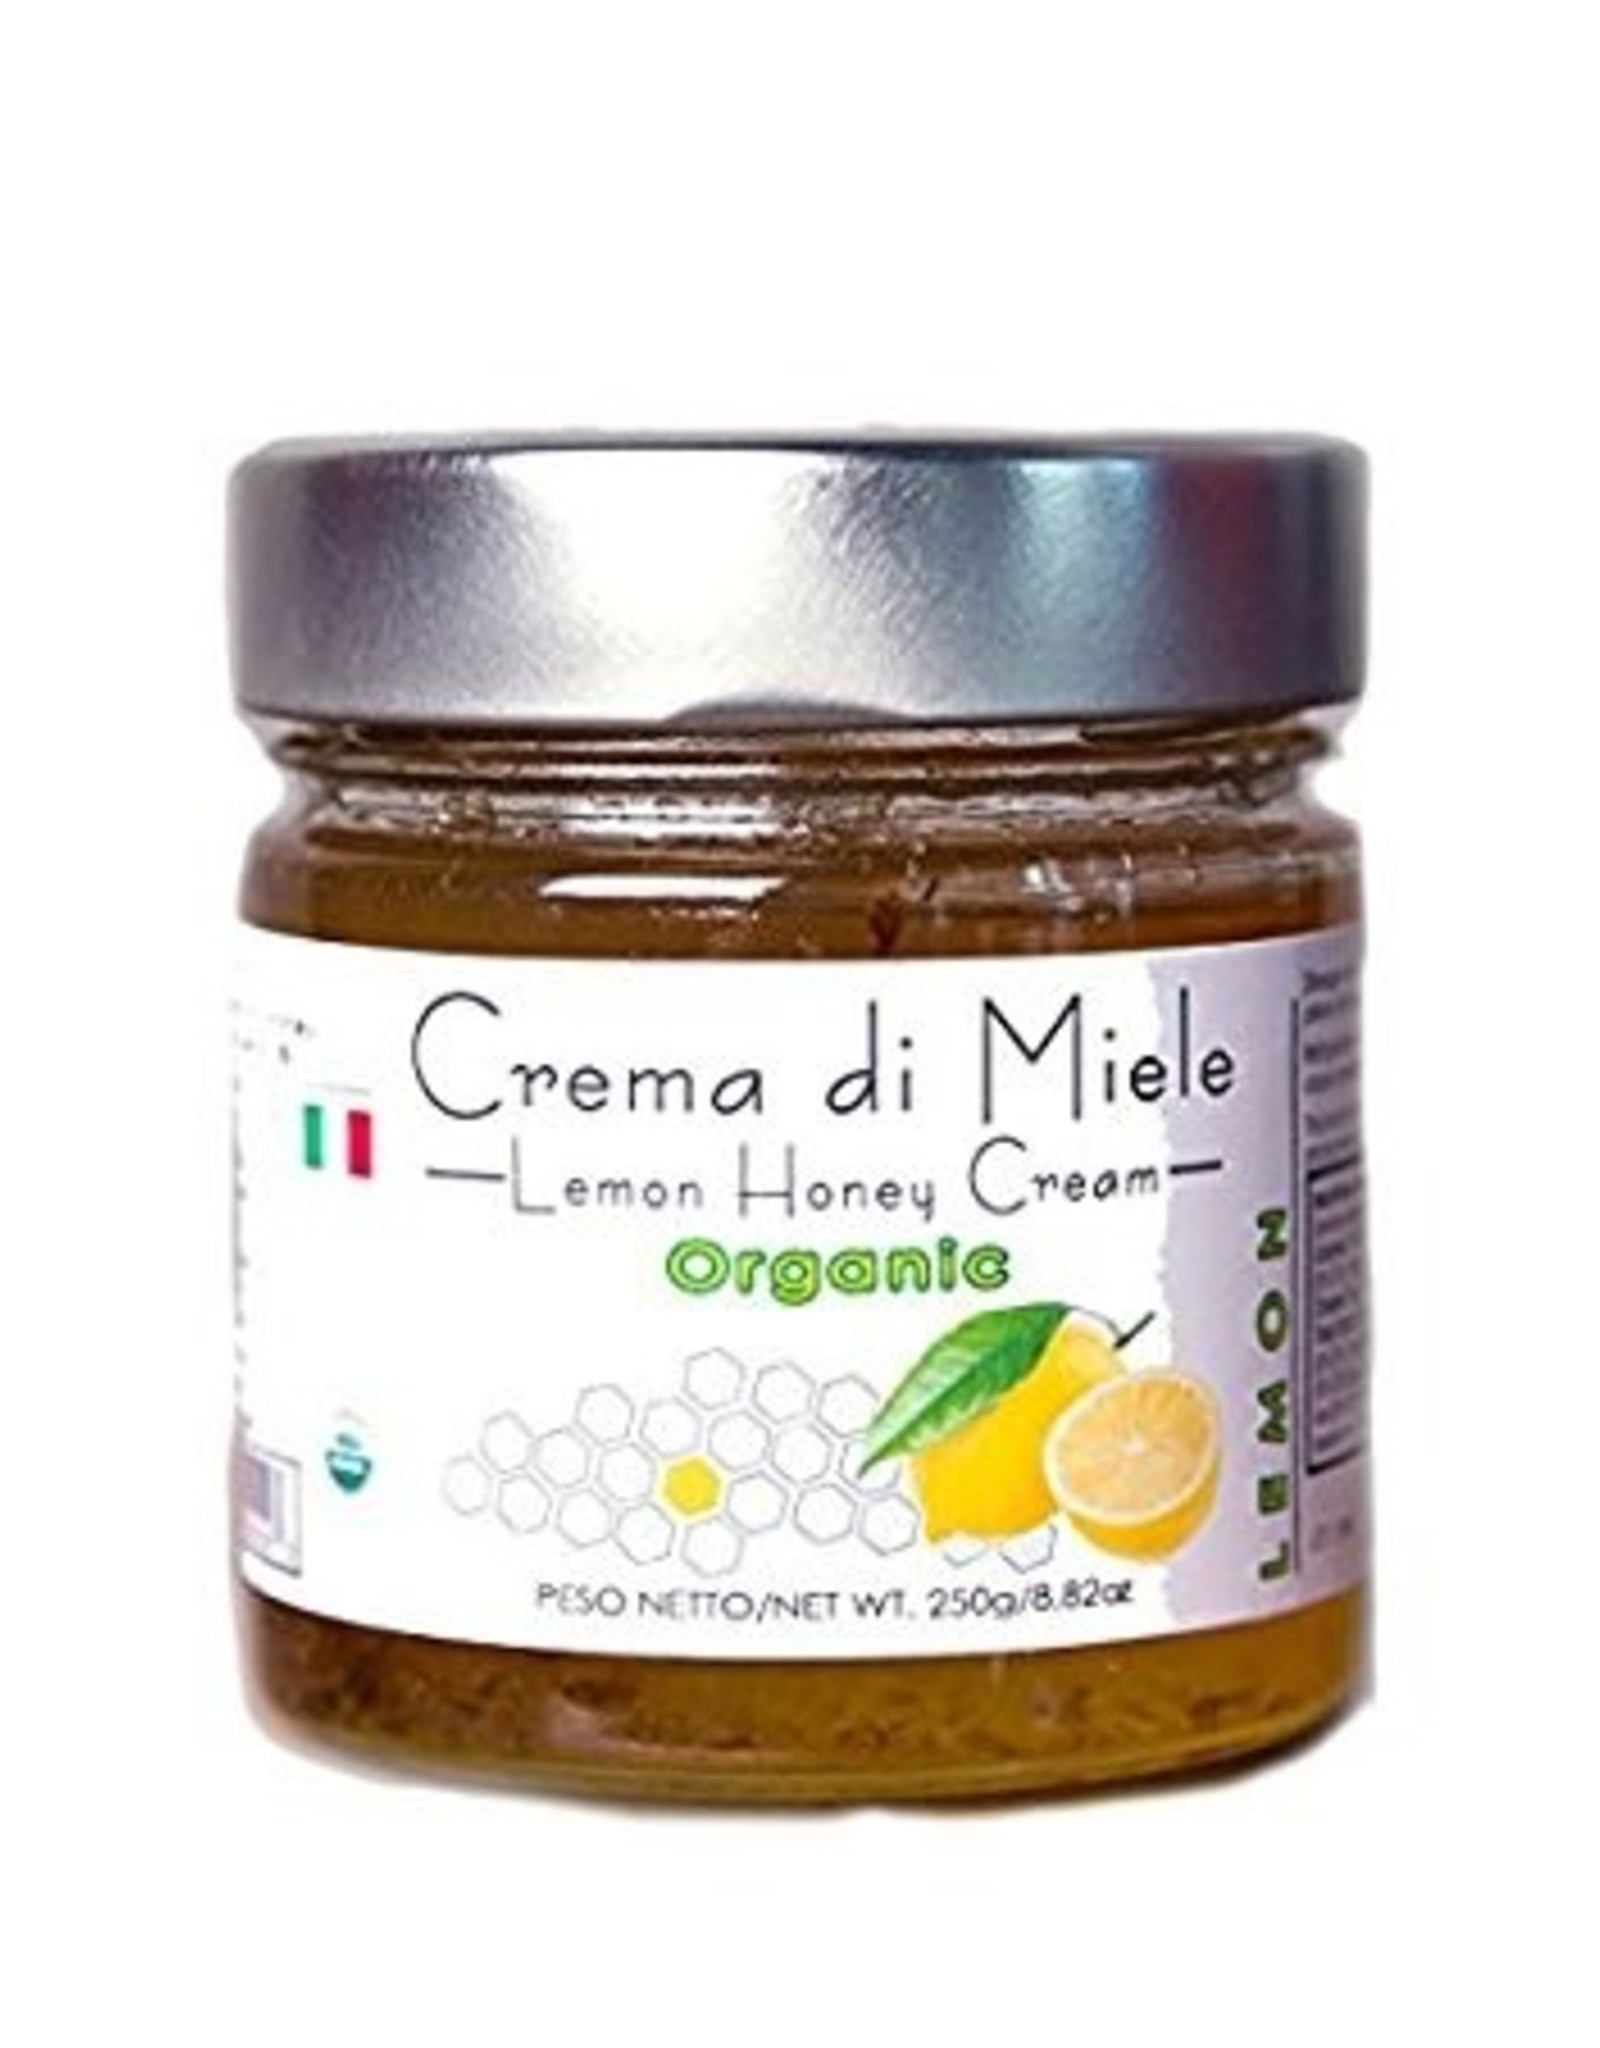 Specialty Foods Crema di Miele, Lemon Infused Acacia Honey, 250g